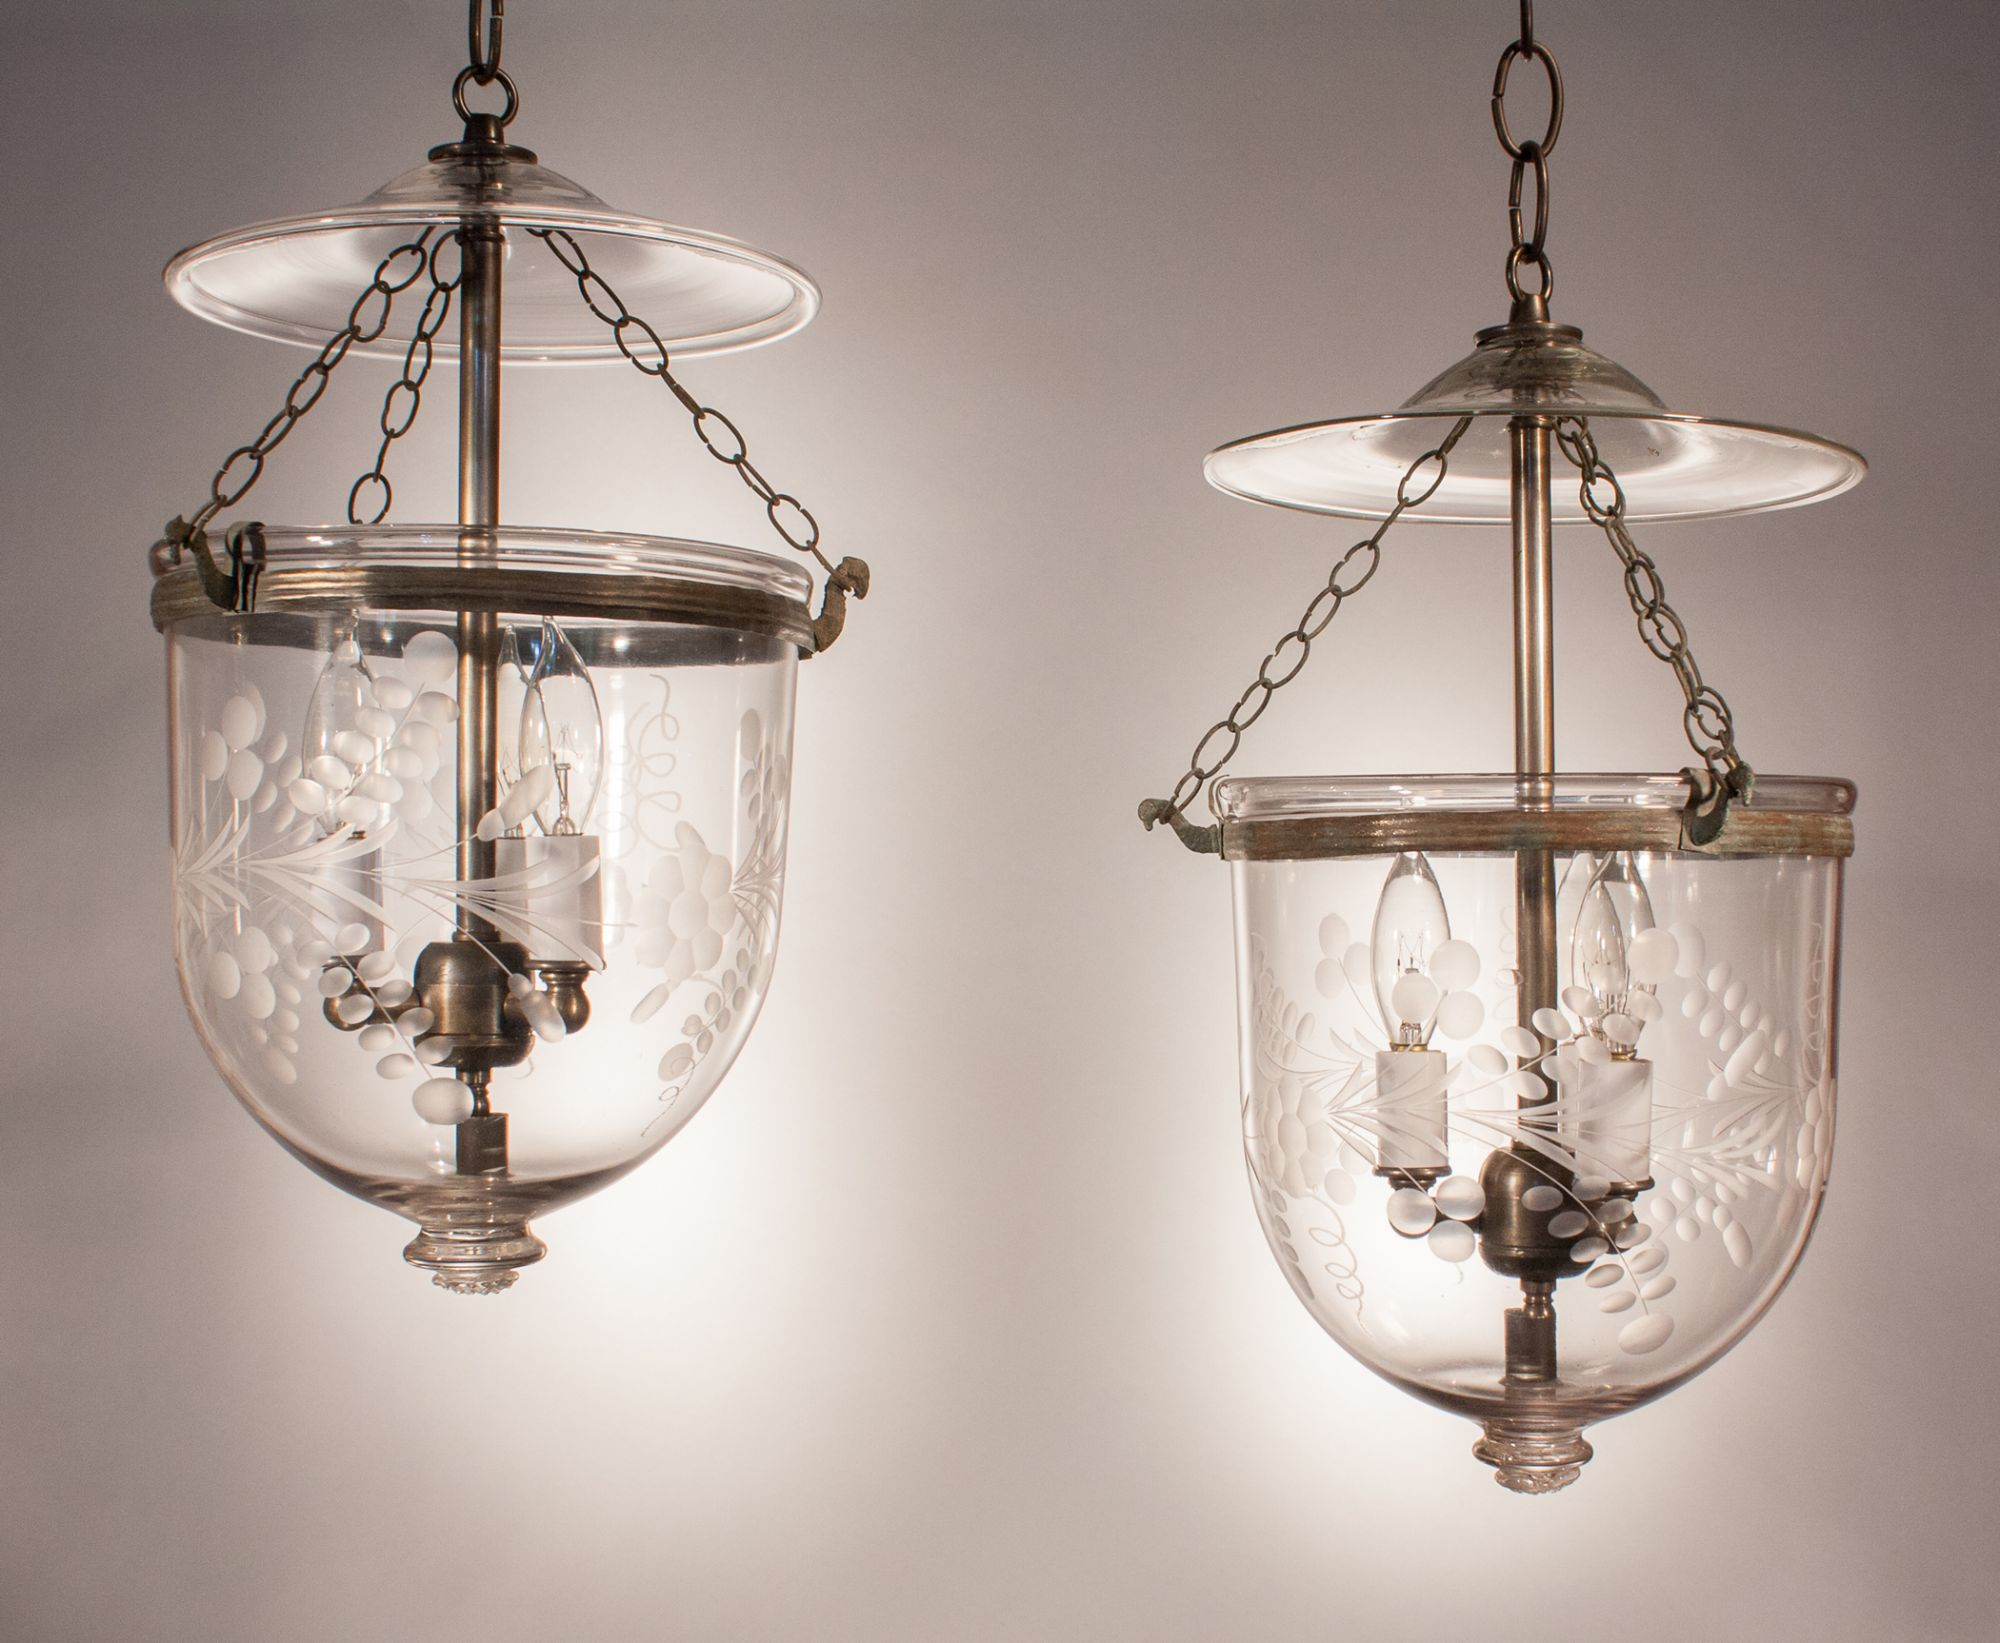 Antique Pair Of Bell Jar Lantern Pendant Lighting Fixture